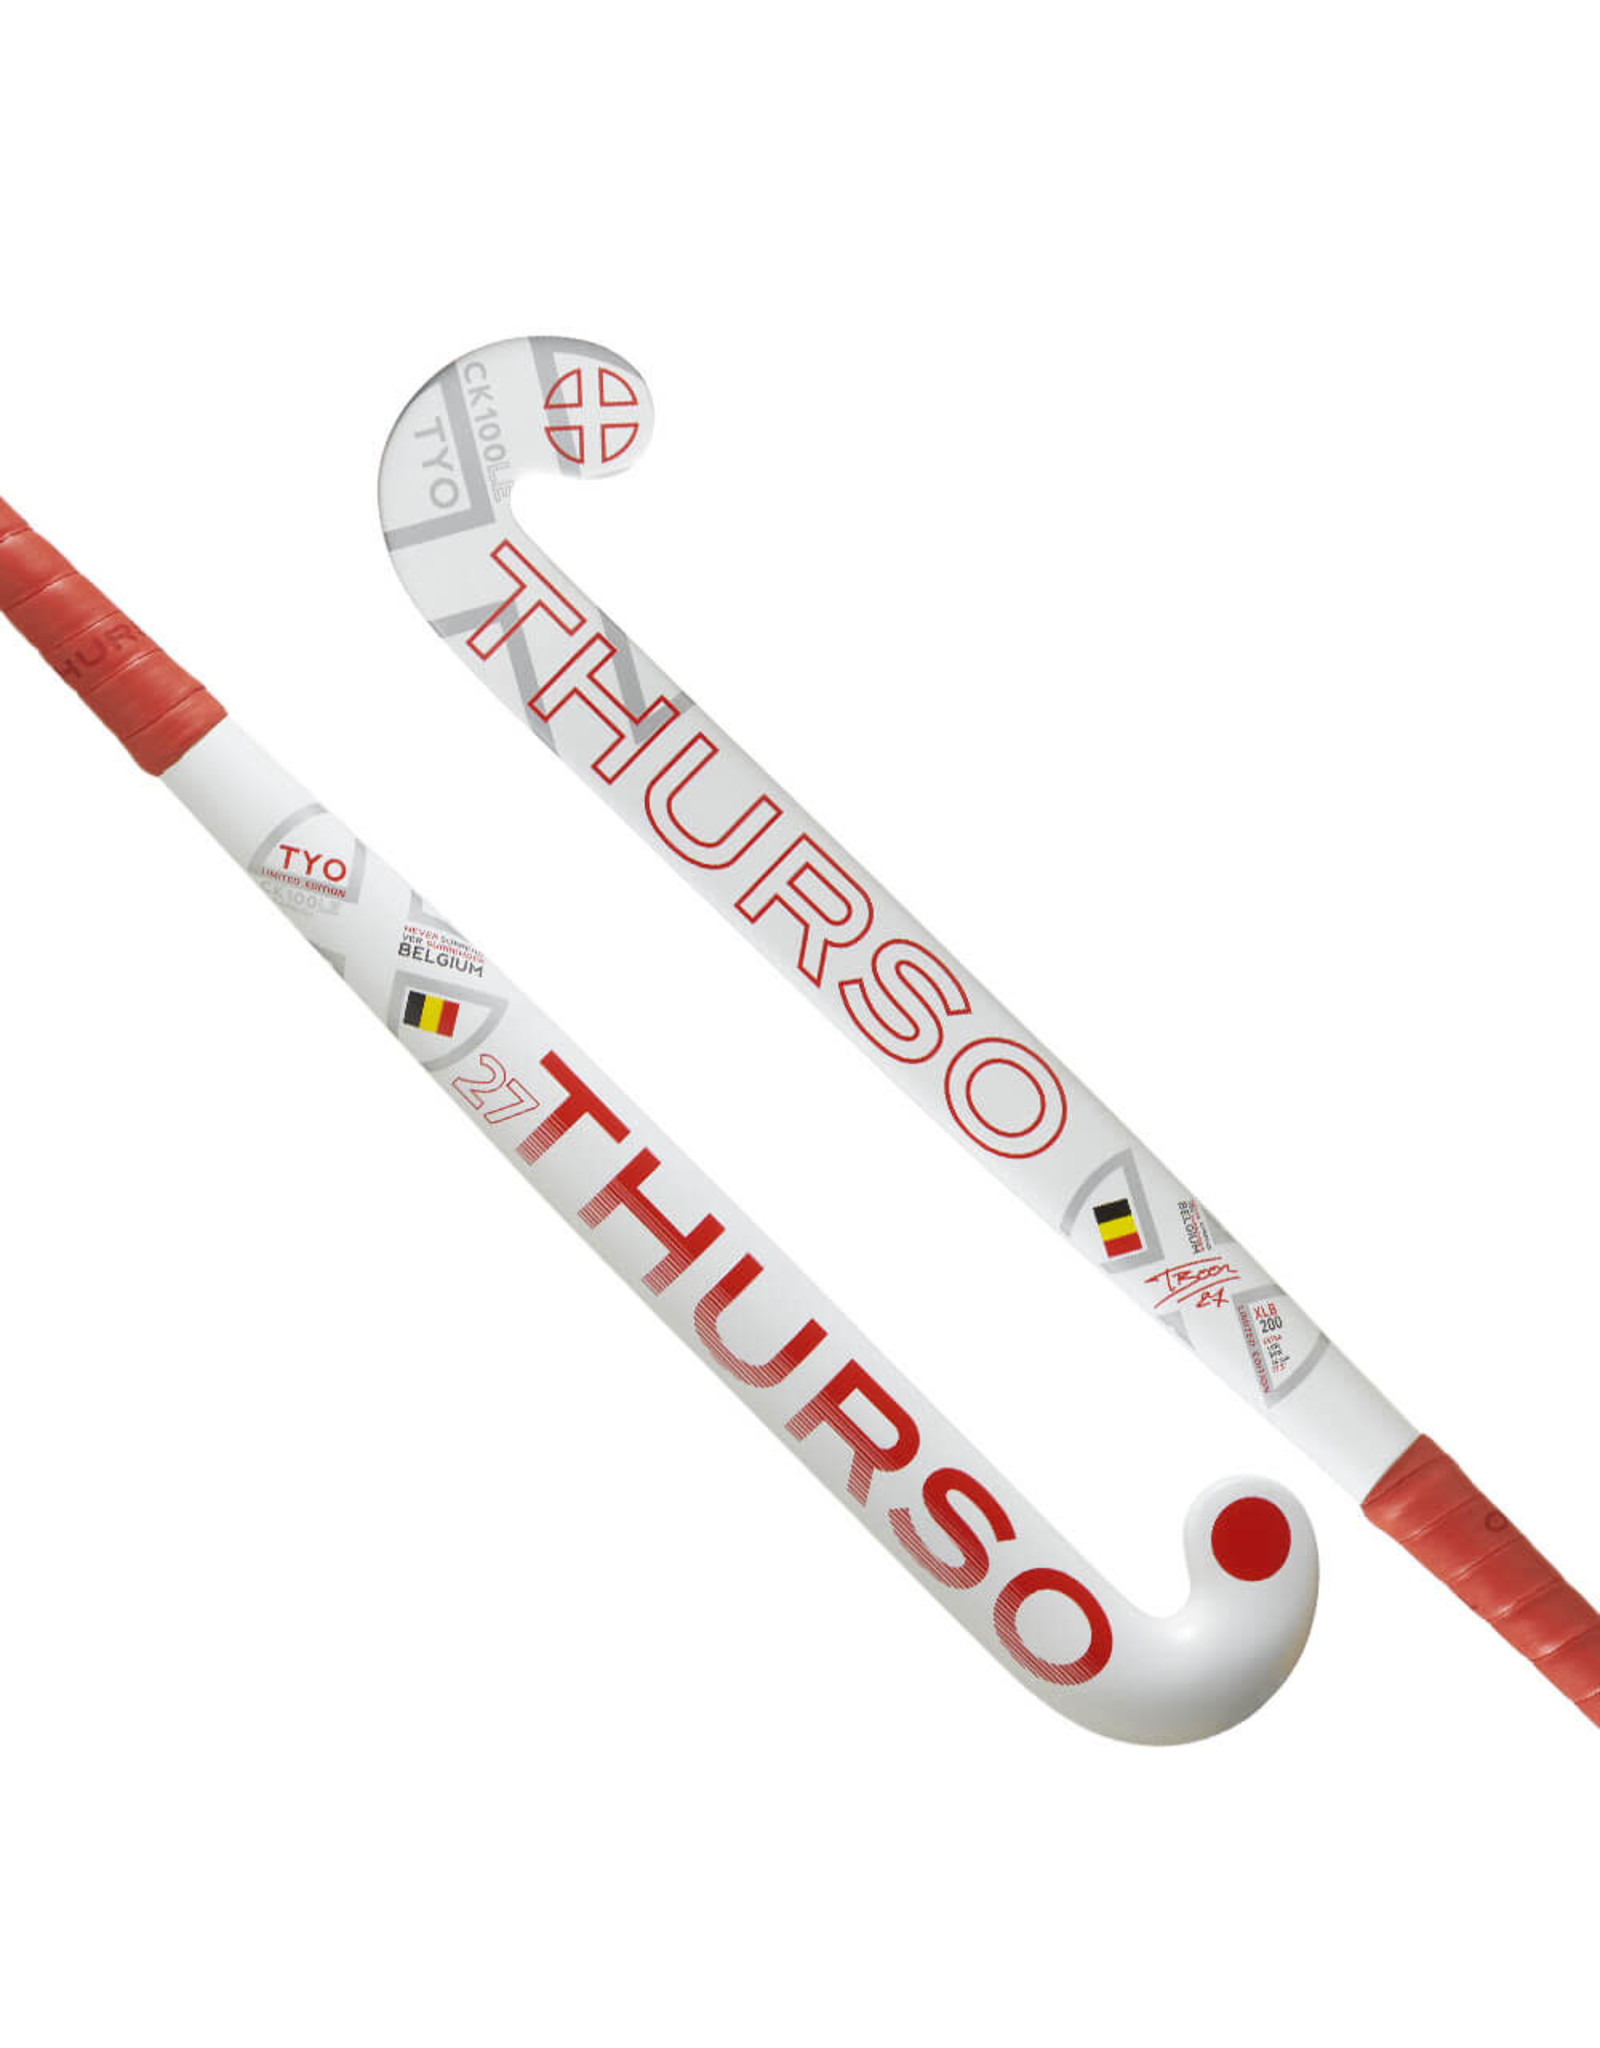 THURSO THURSO TOKYO CK 100 XLB 20-21 STICK